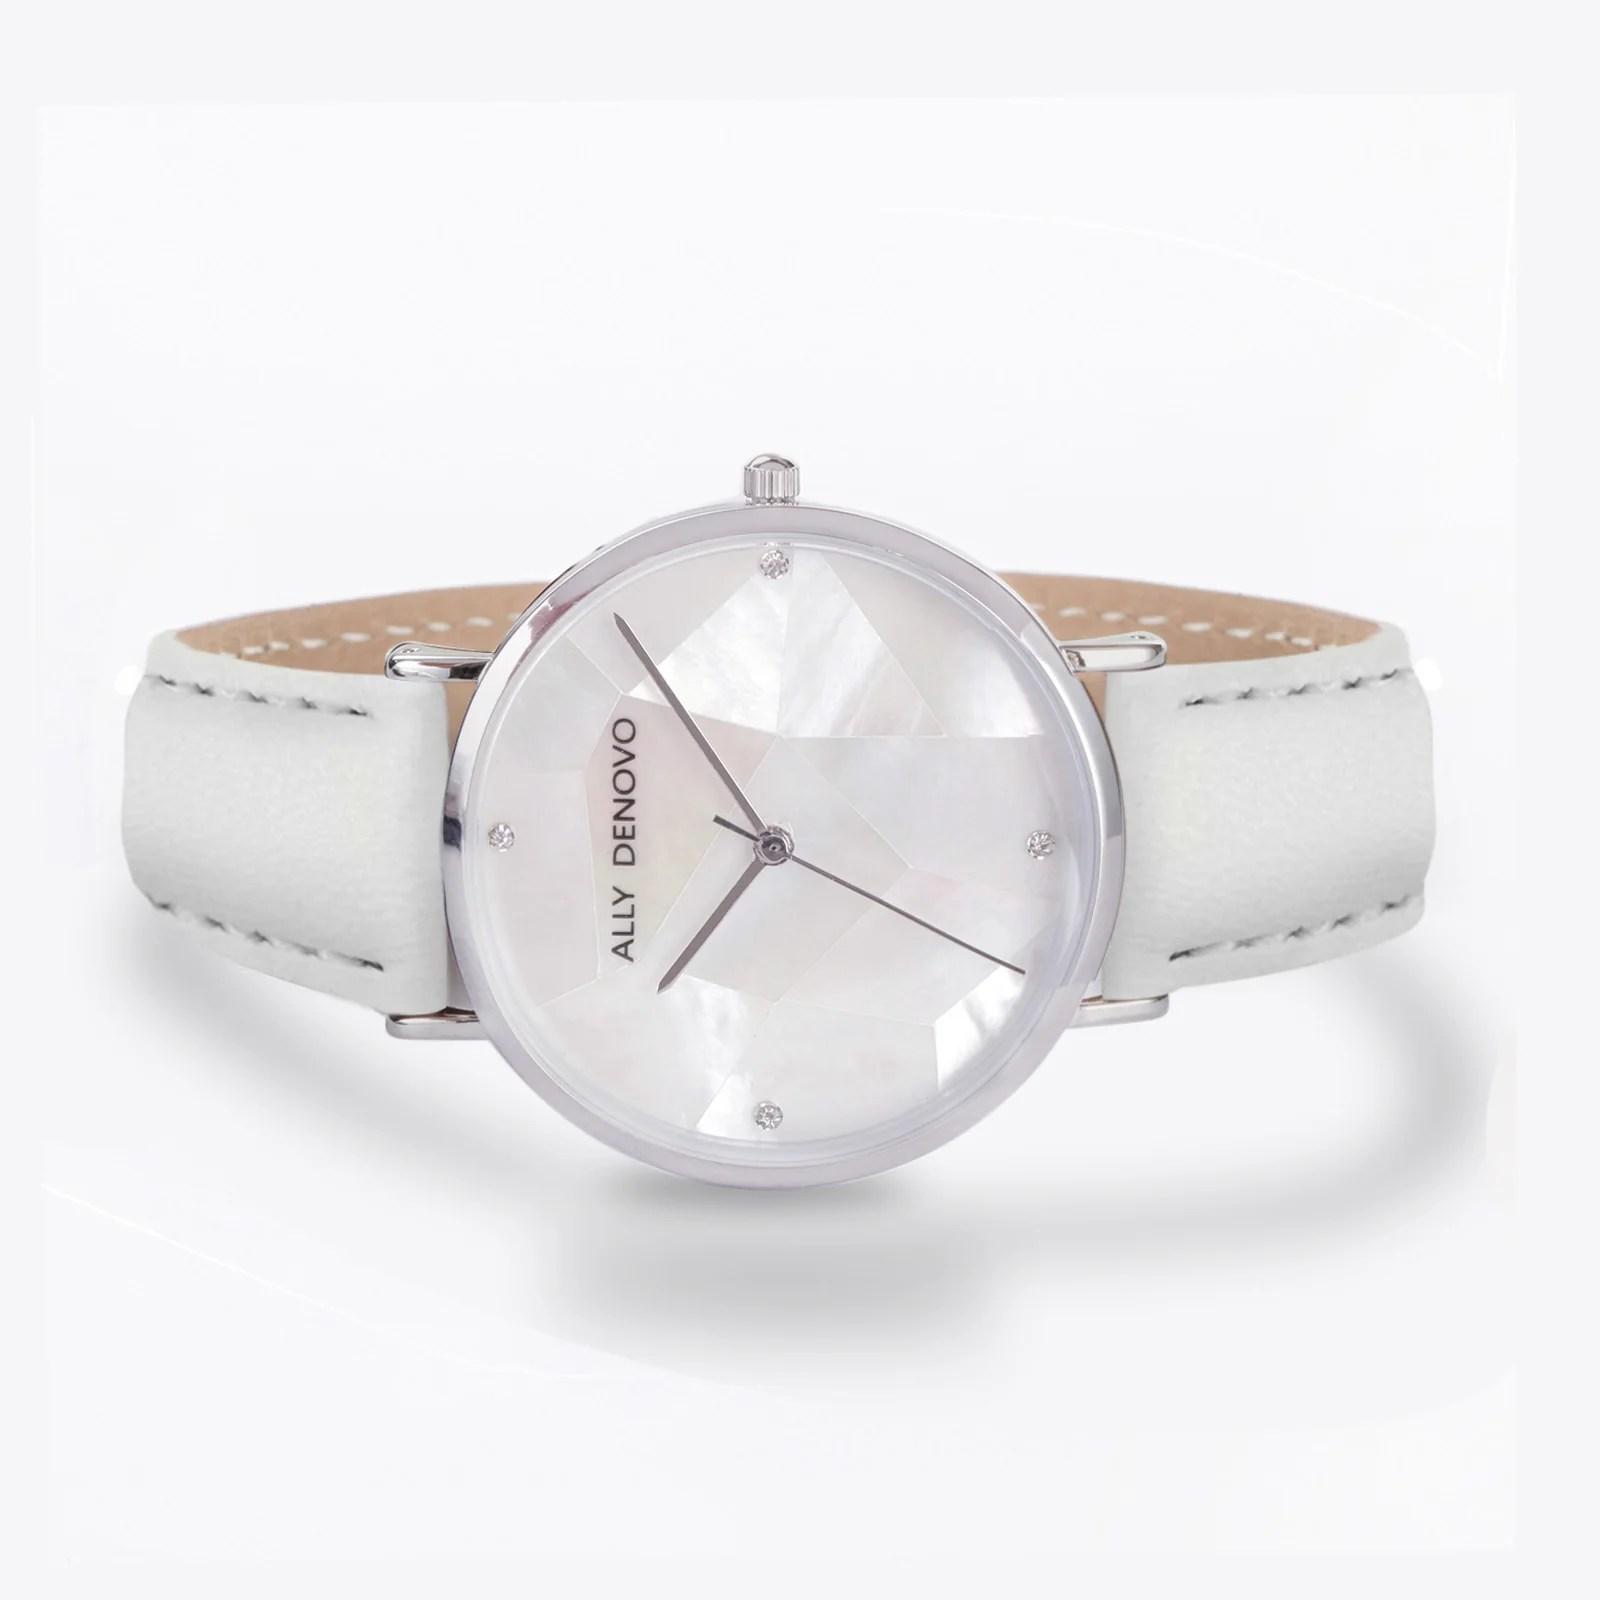 Gaia pearl皮革腕錶-白色菱形琉璃白框白色真皮錶帶 AF5003.6 – ALLY DENOVO 中文官方網站